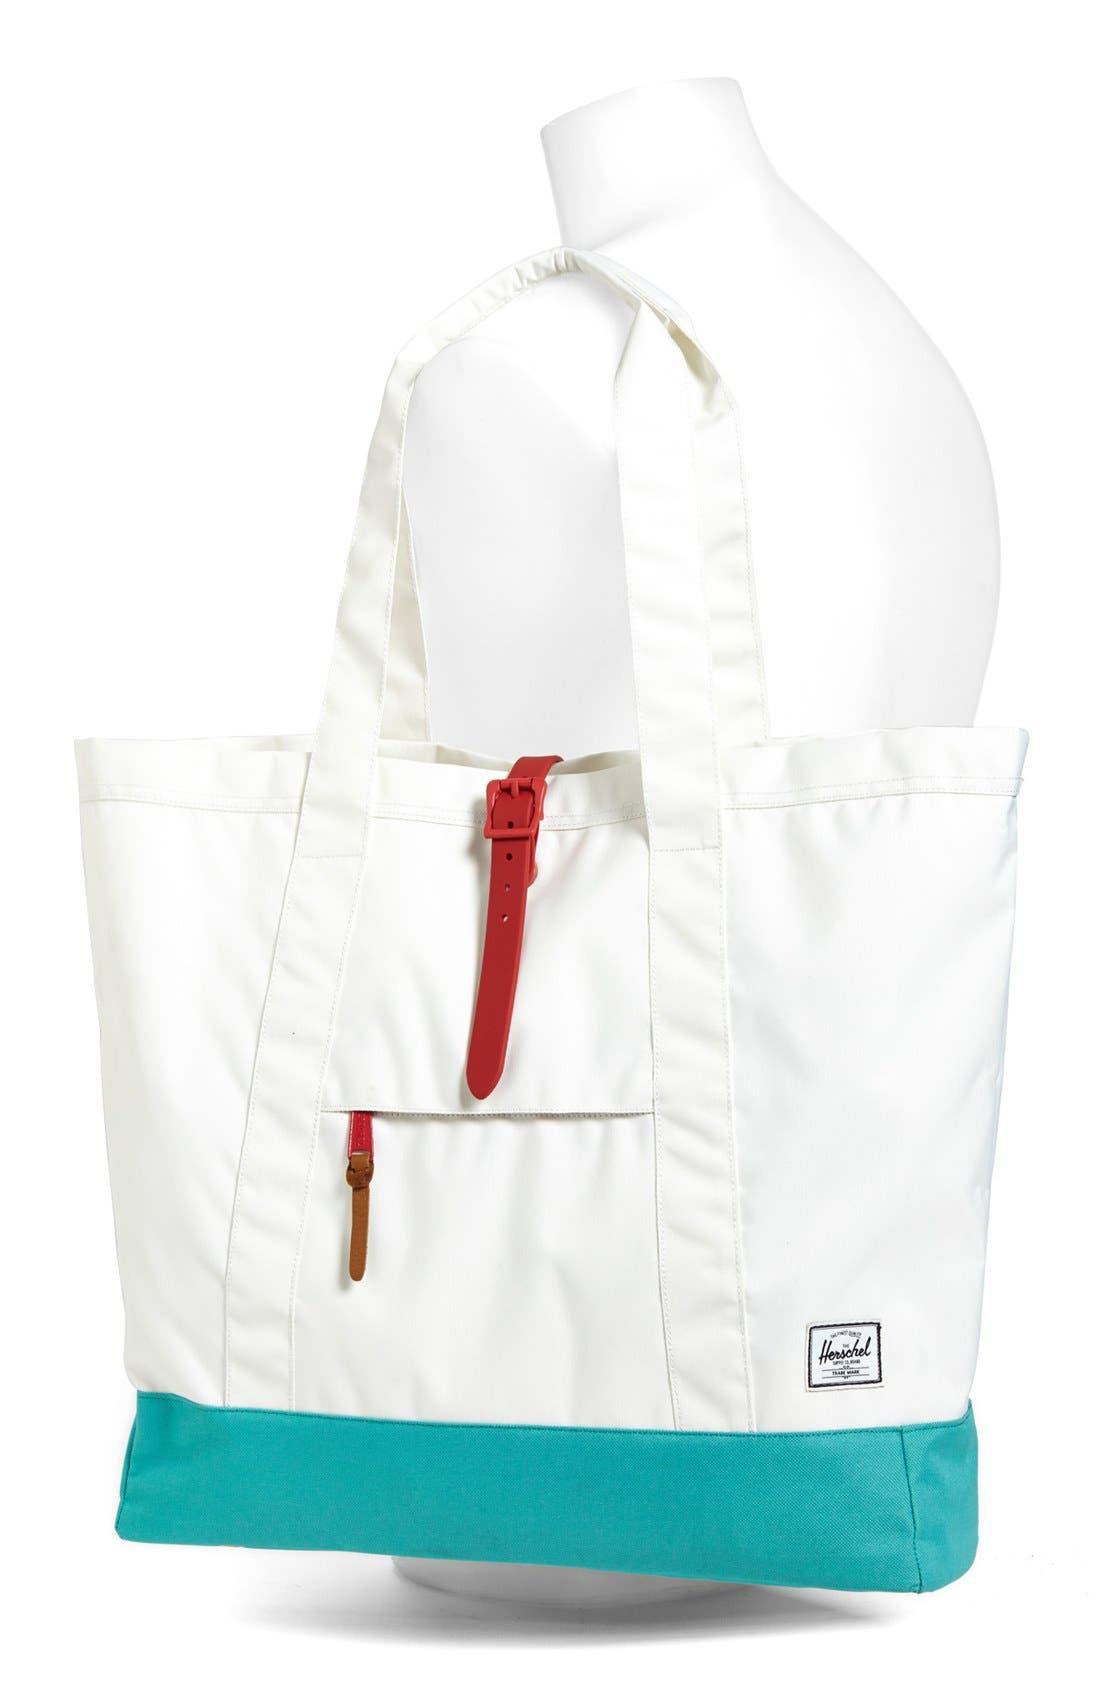 Alternate Image 2  - Herschel Supply Co. 'Market - Studio Collection' Large Tote Bag